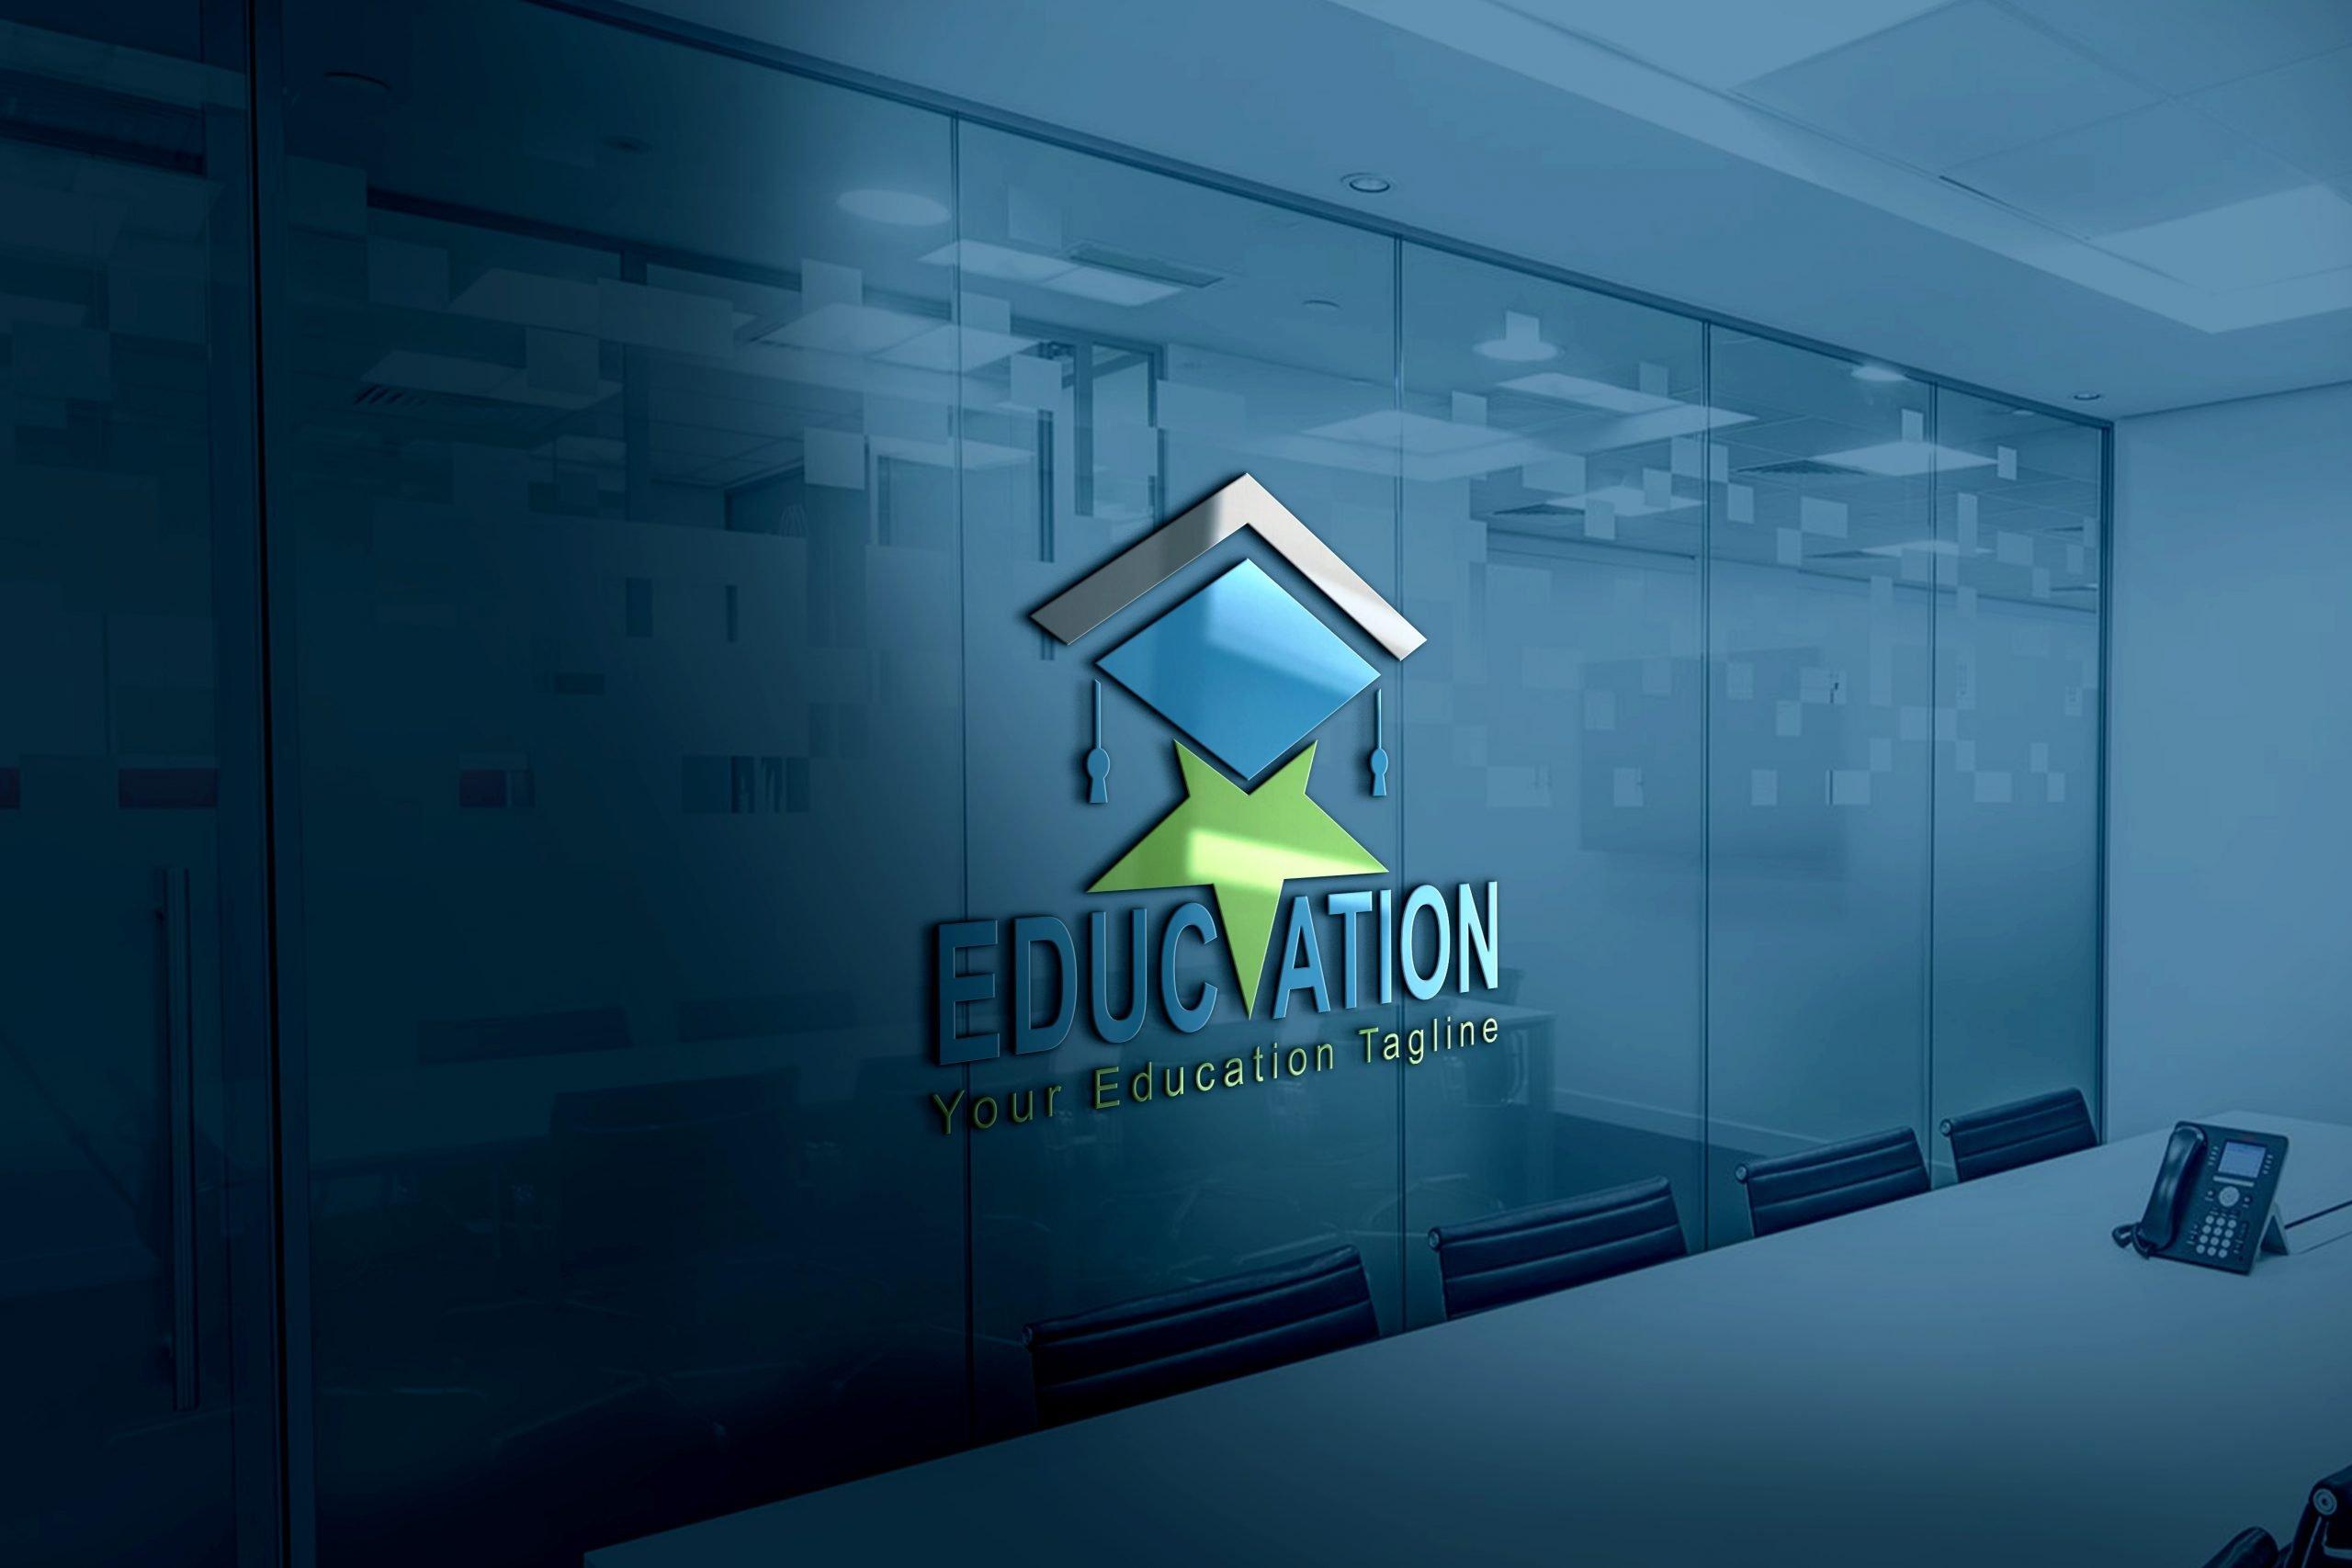 Star education logo design on office wall